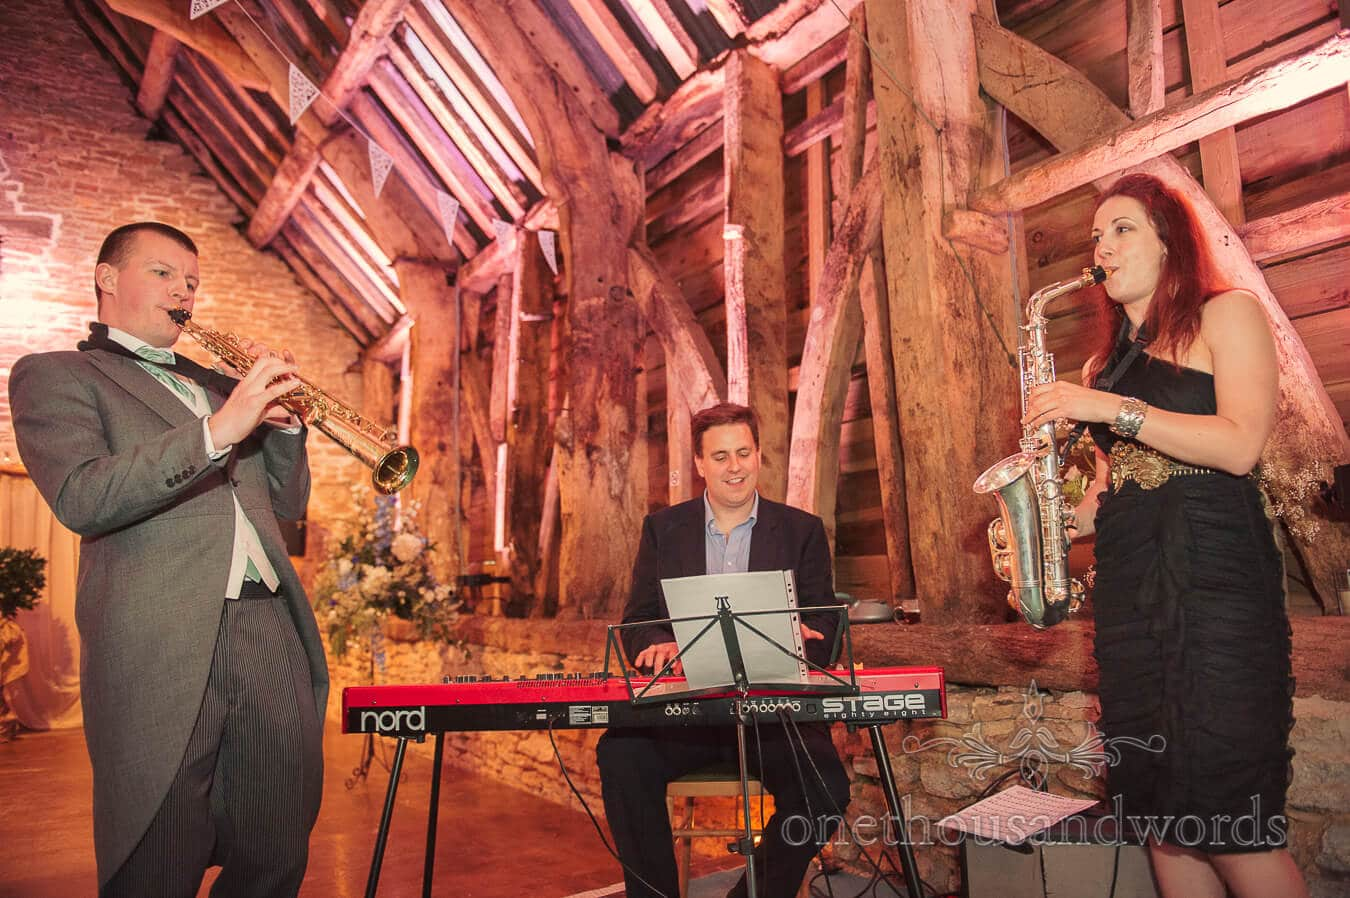 Wedding Musicians at Stockbridge Farm Barn Country Theme Wedding